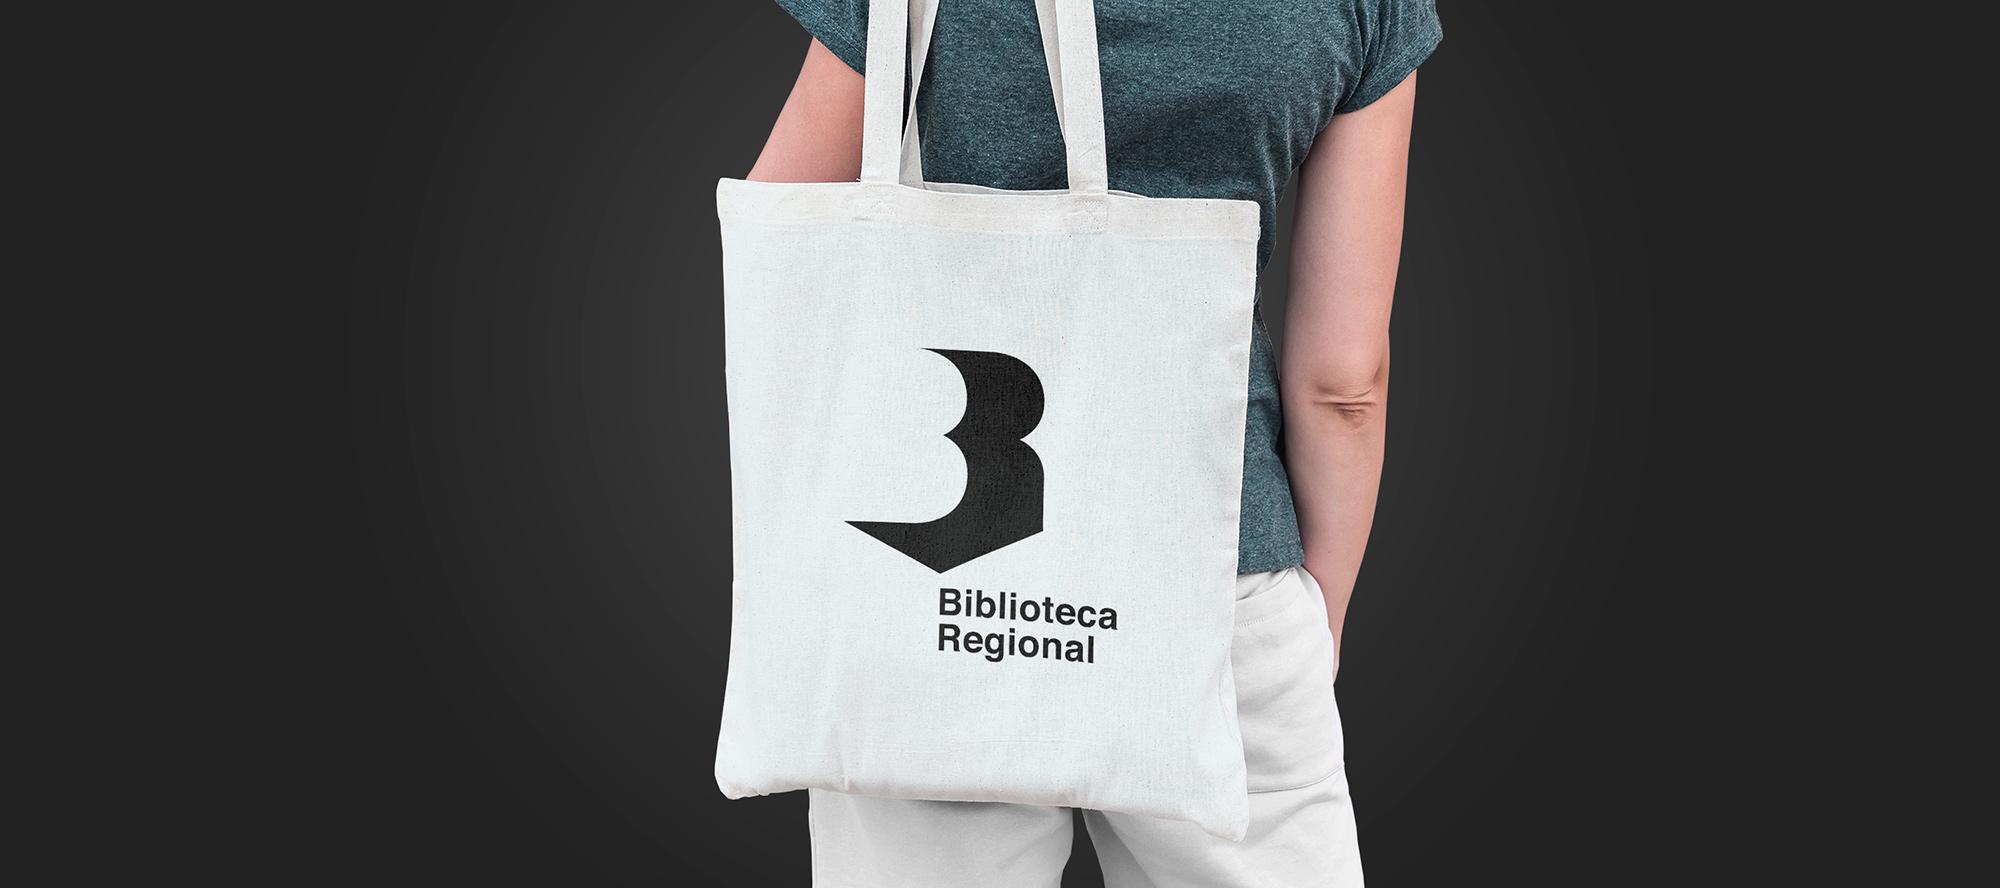 Biblioteca-regional-branding-05